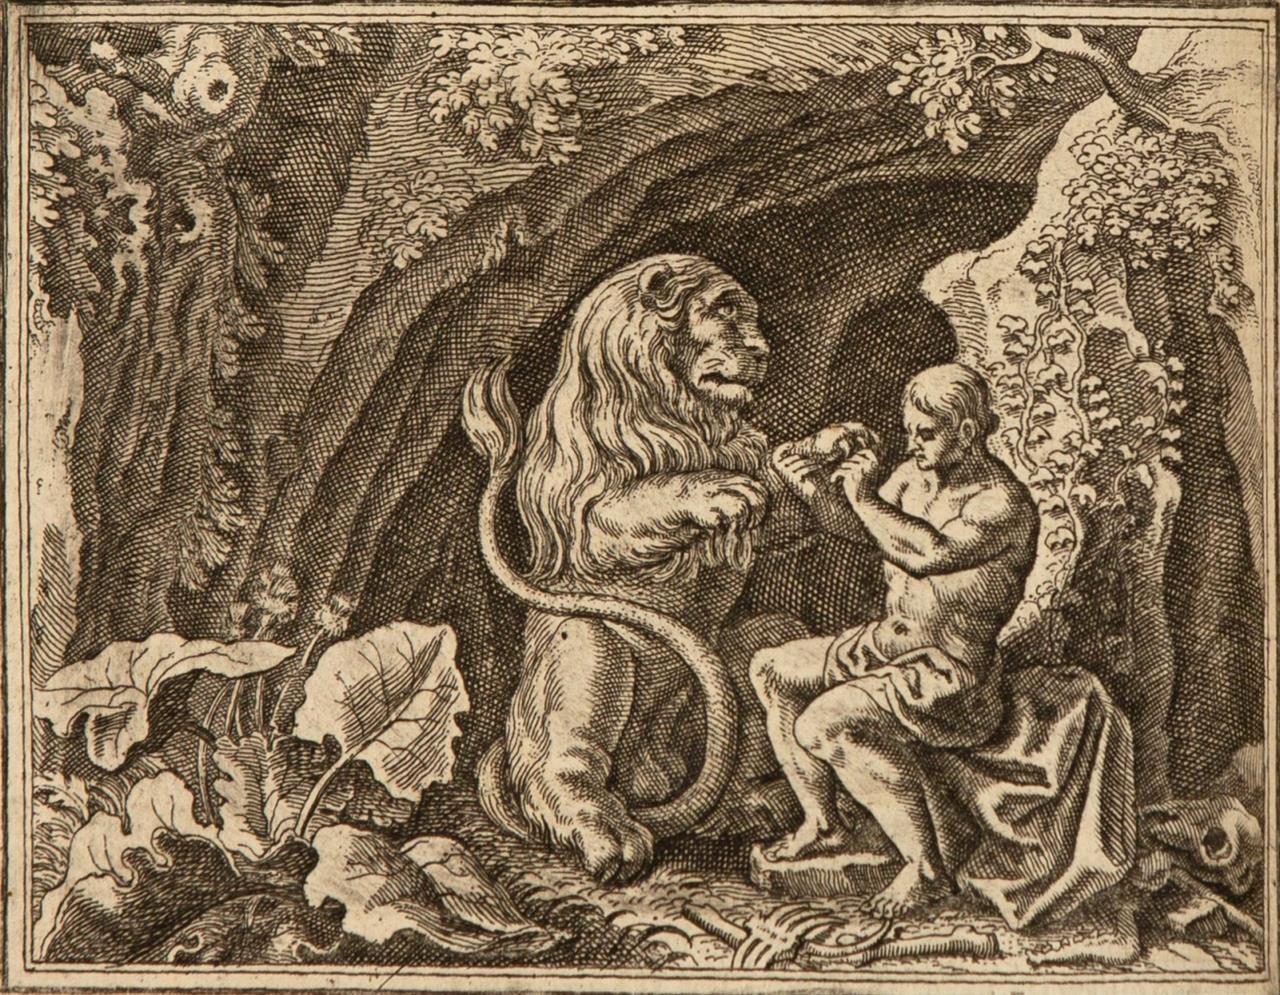 J. L. Gottfried, Historische Chronick .... Tl. 1 (v. 3).  Frankfurt a. M. 1743.